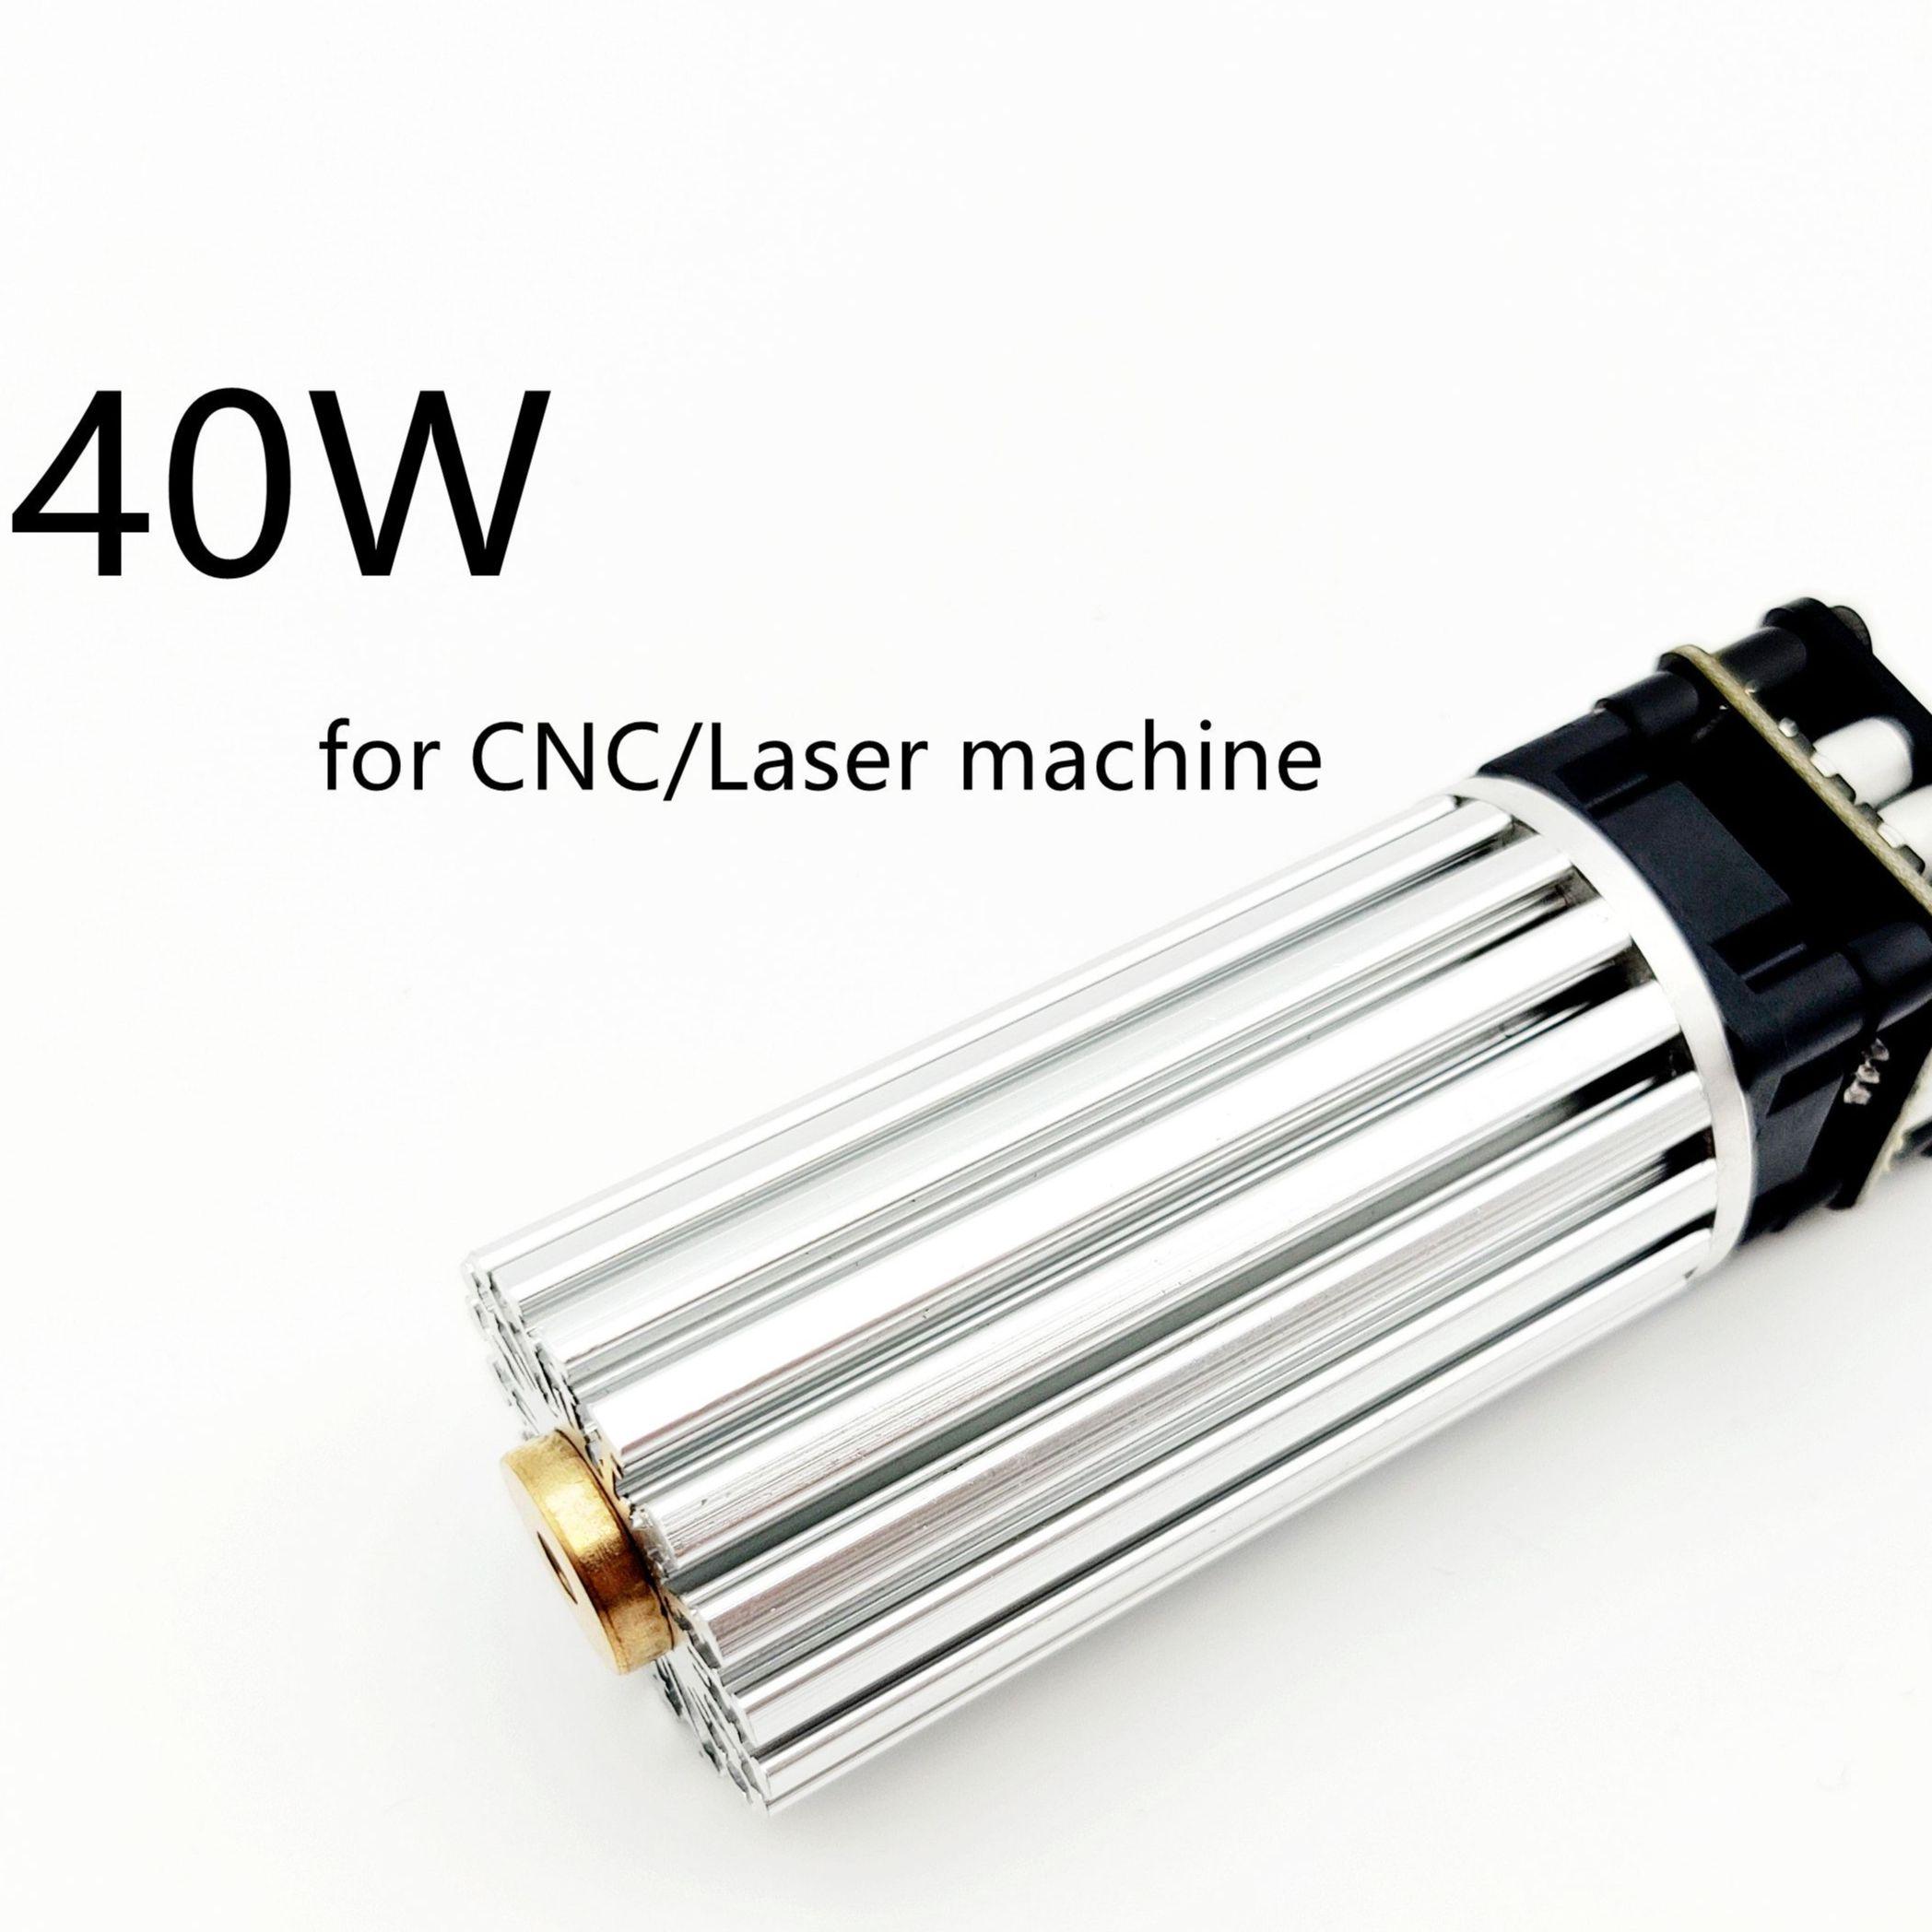 40W 450nm laser module for laser engraving machine cnc3018 40w bule  laser head DIY engraving high power laser